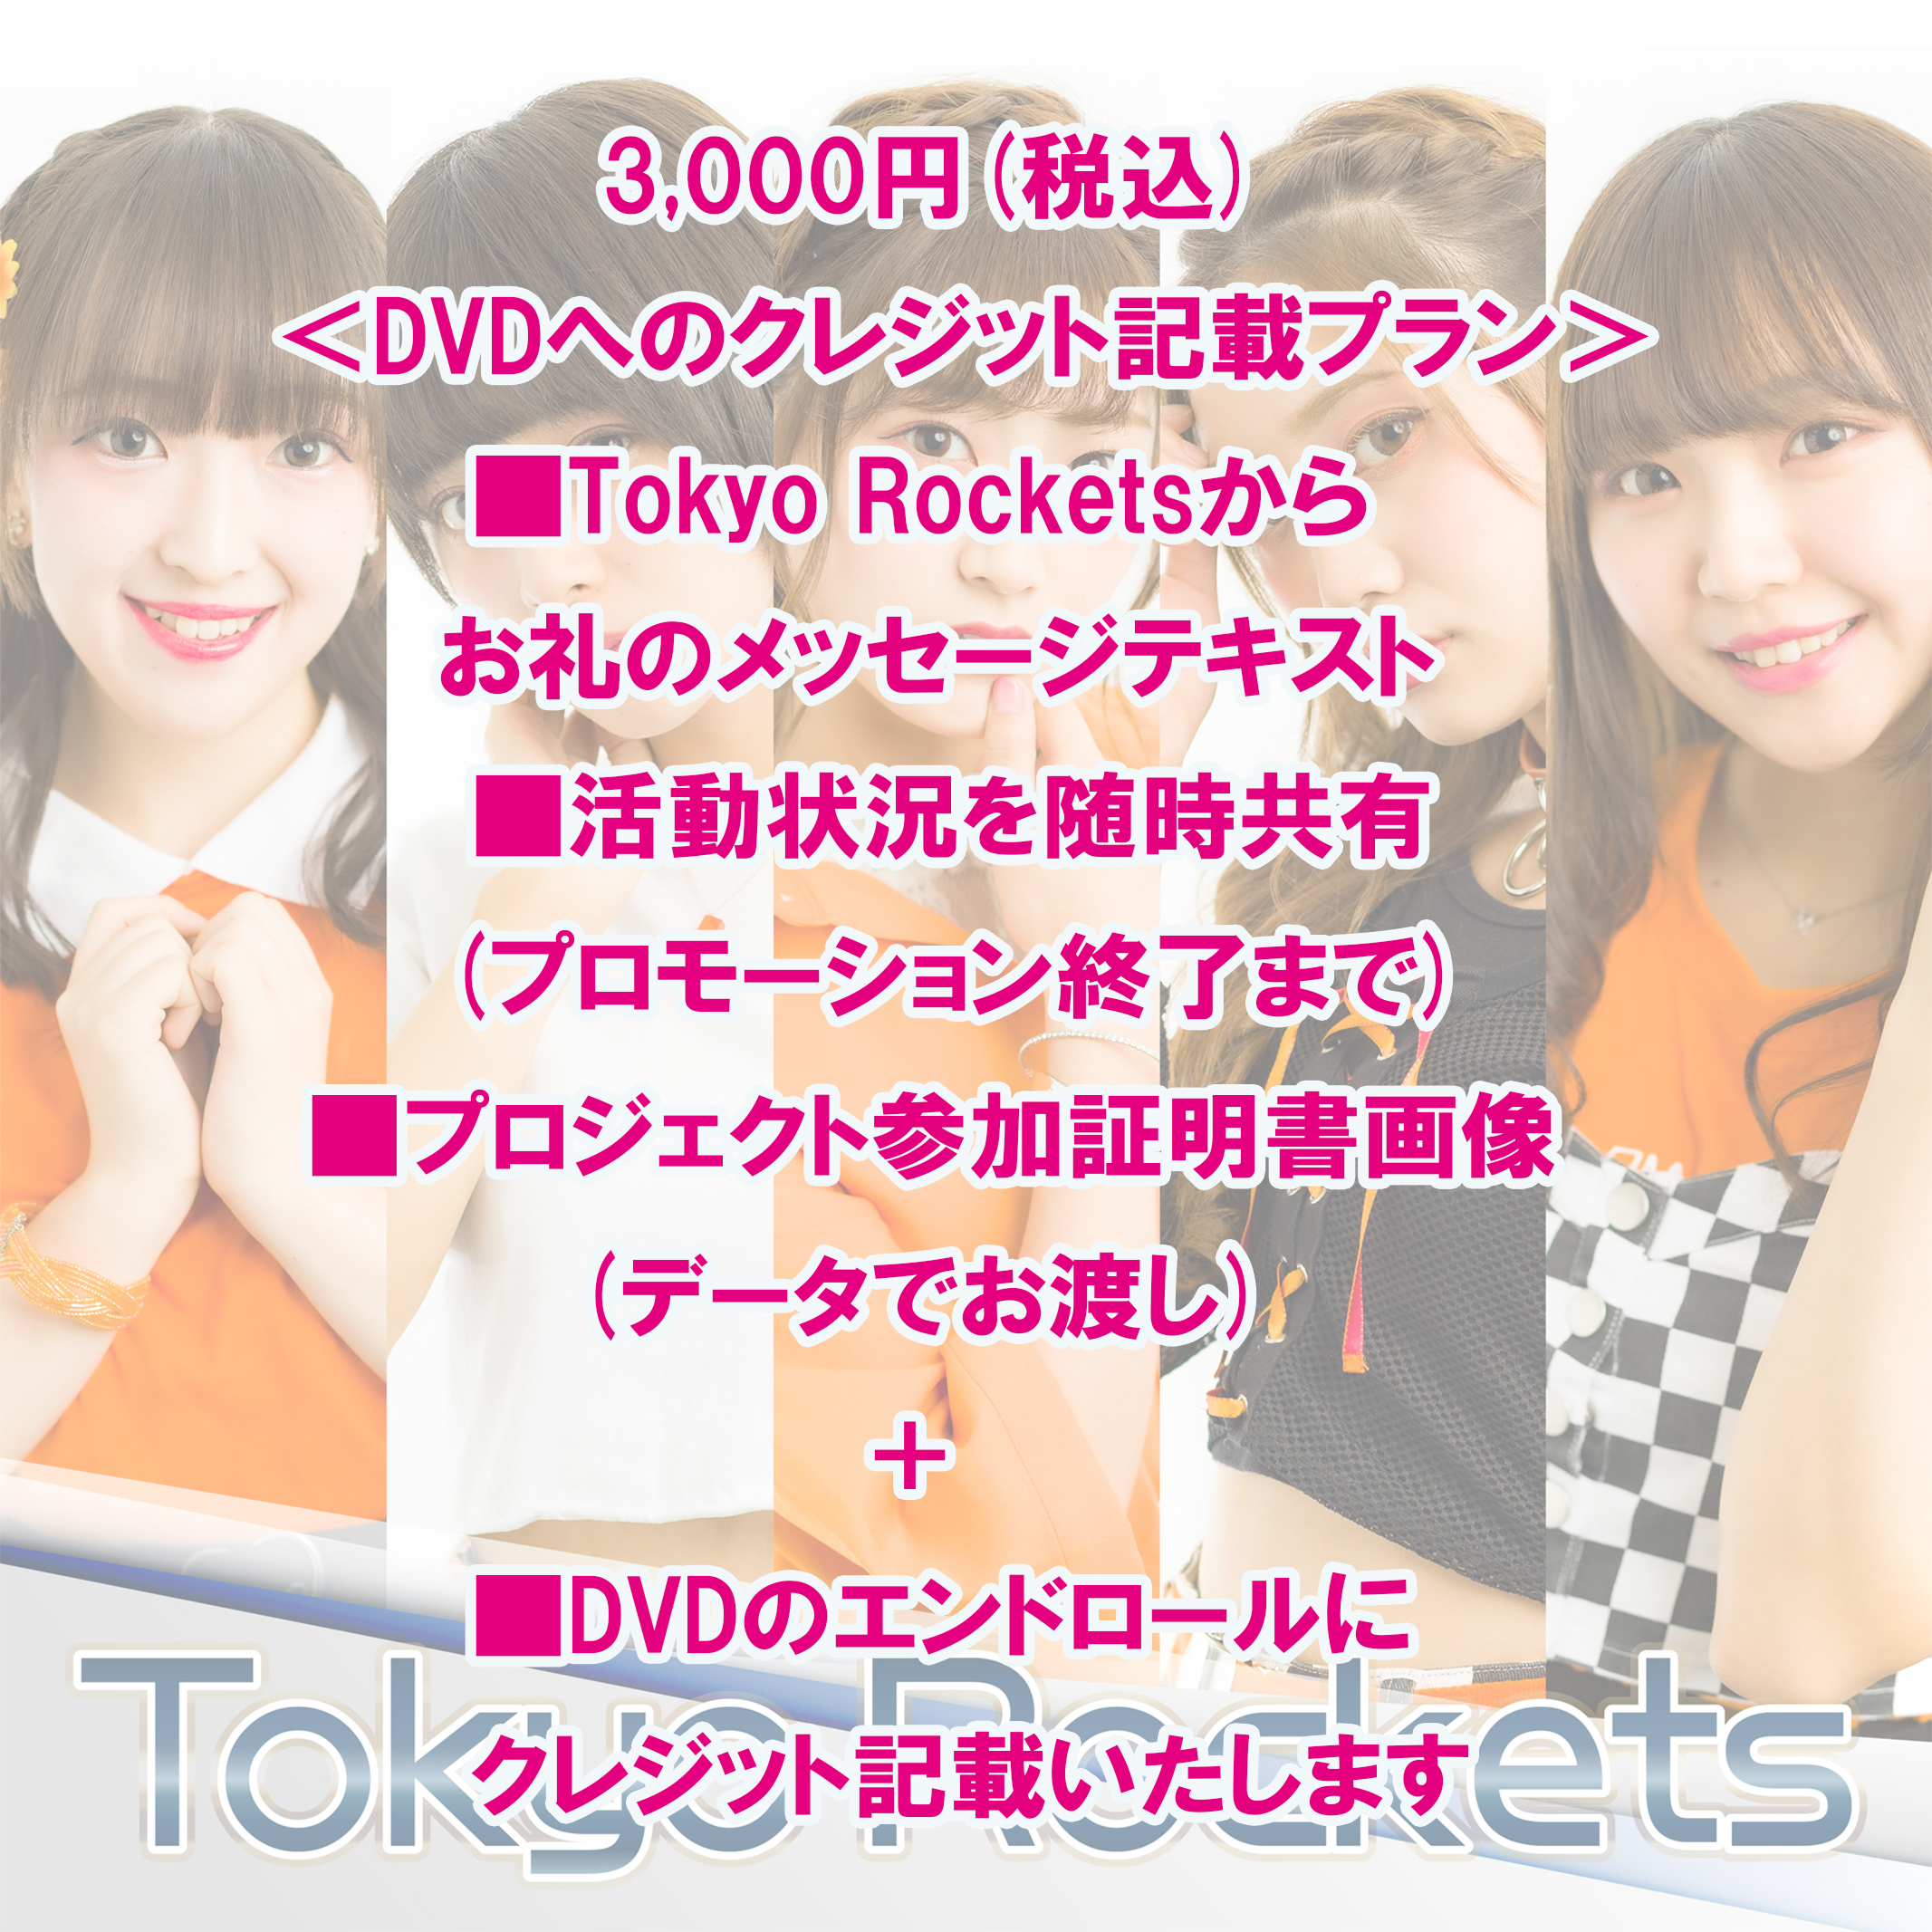 <DVDへのクレジット記載プラン>